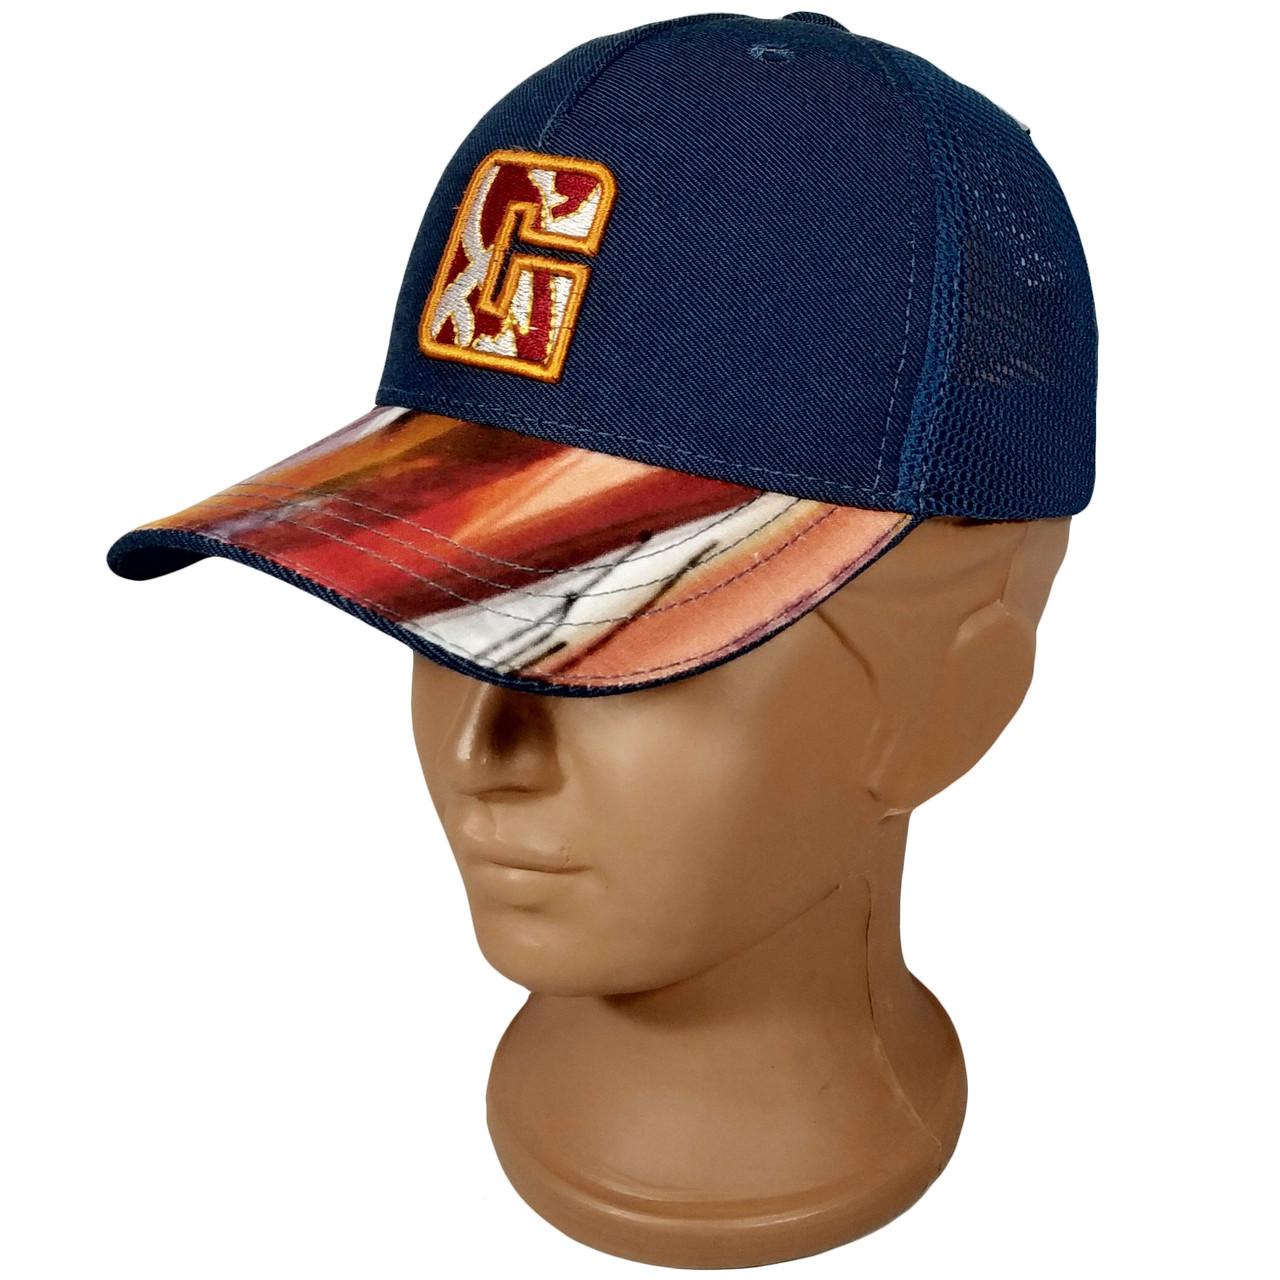 Бейсболка подросток, размер: 49-50, 51-52, 53-54, 55-56. Код BP1 S4DG1 (001132)